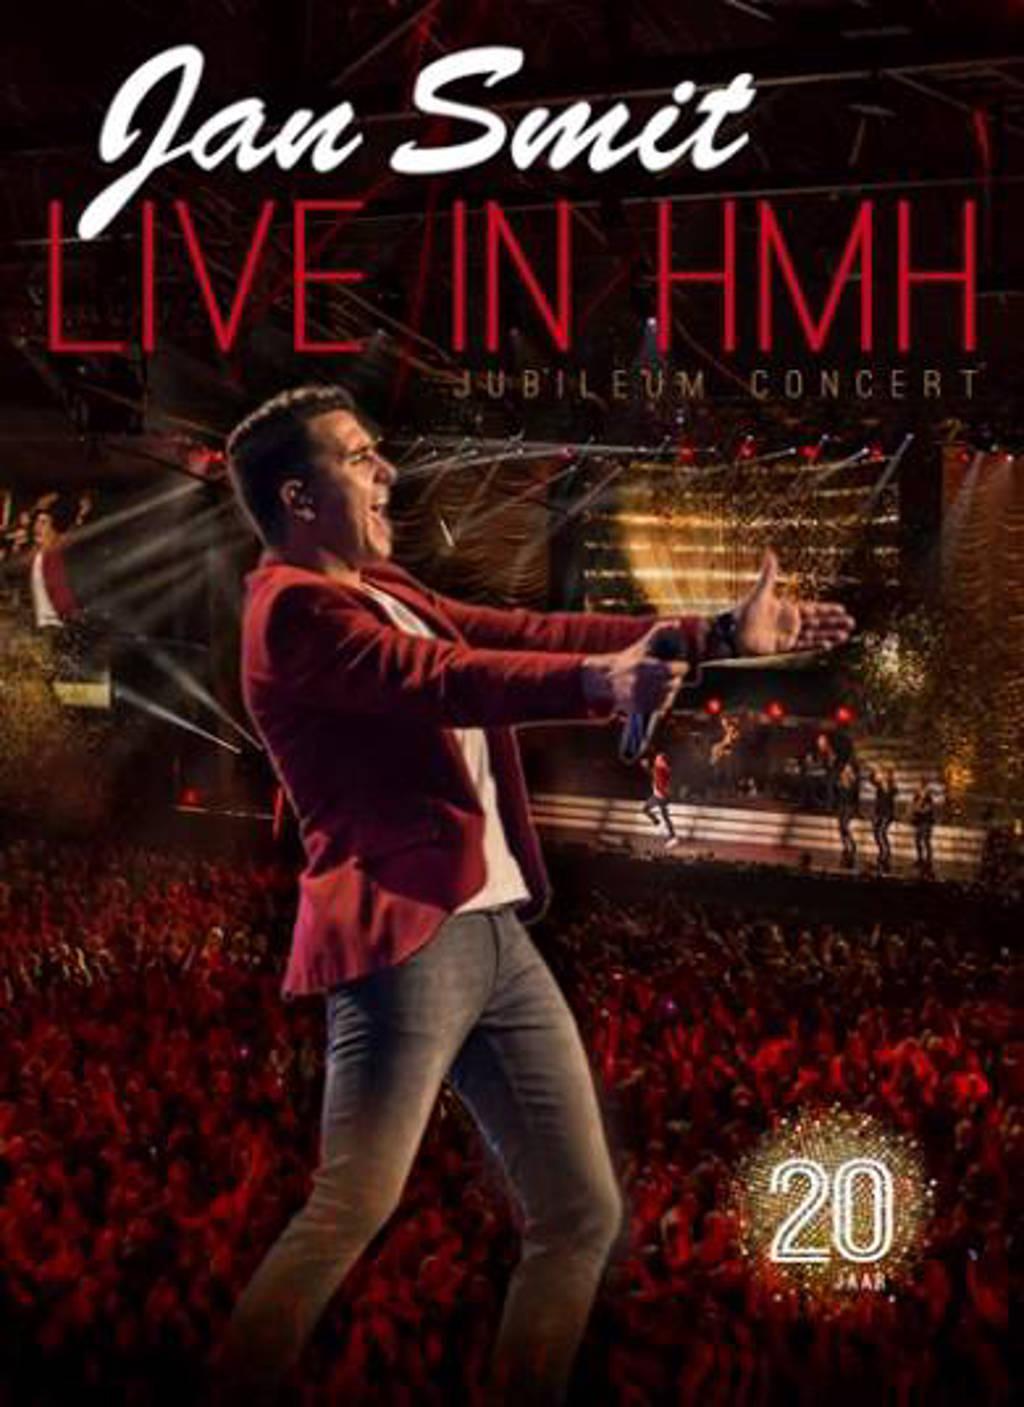 Jan Smit - Live In Hmh (Jubileum Concert) (DVD)